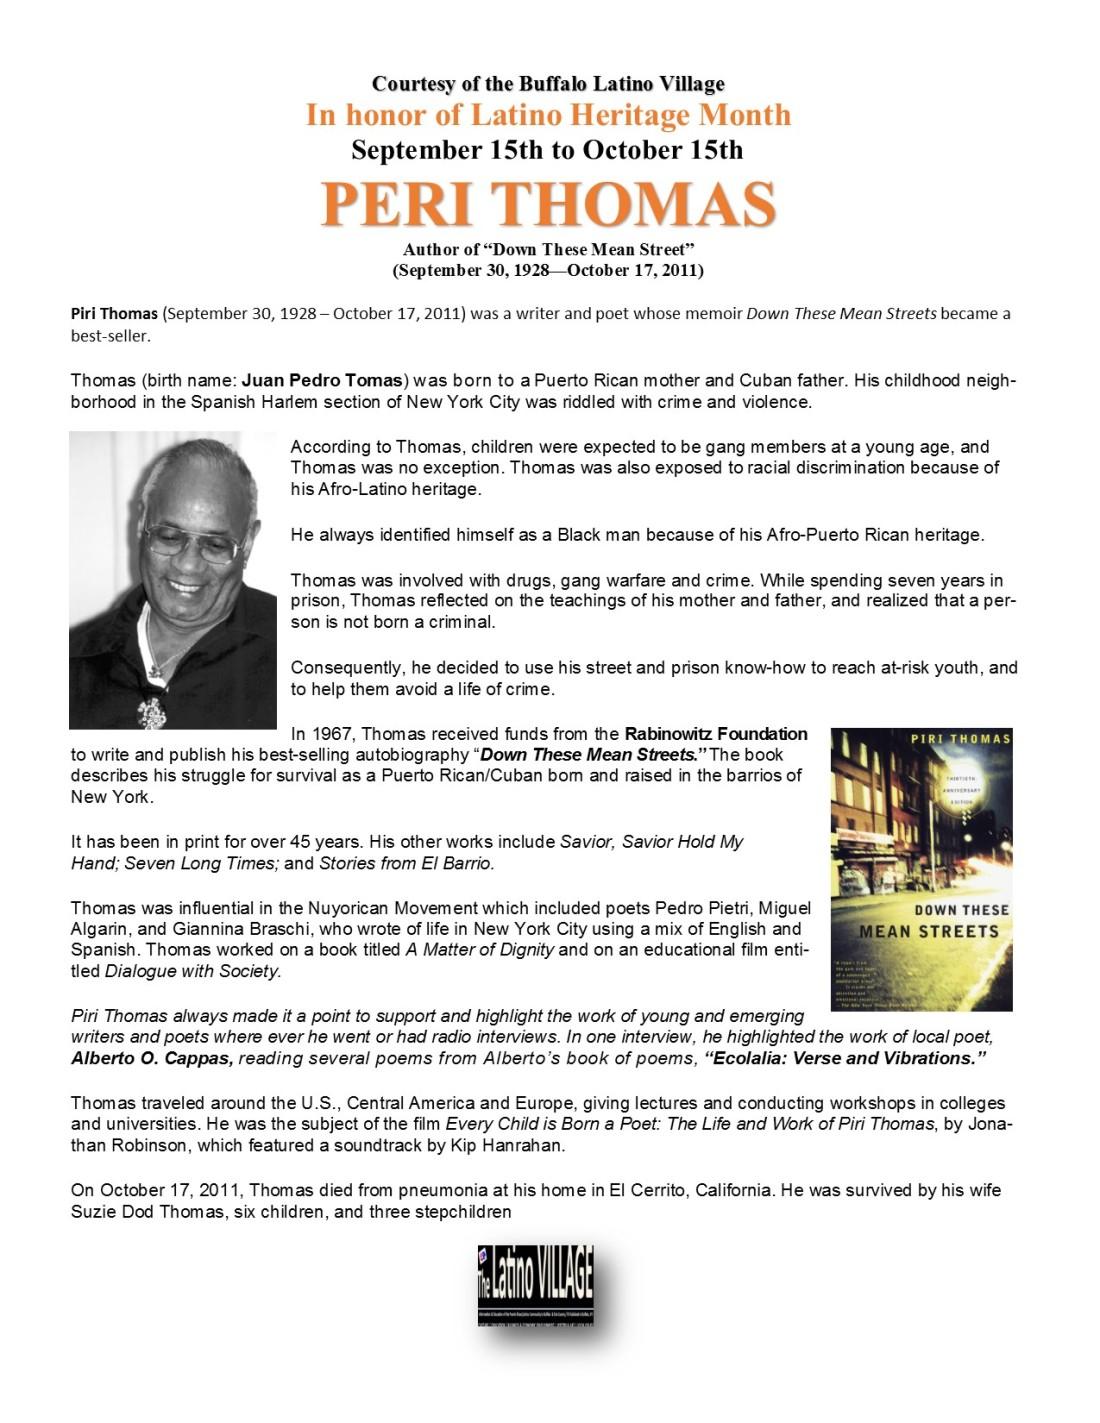 Piri Thomas